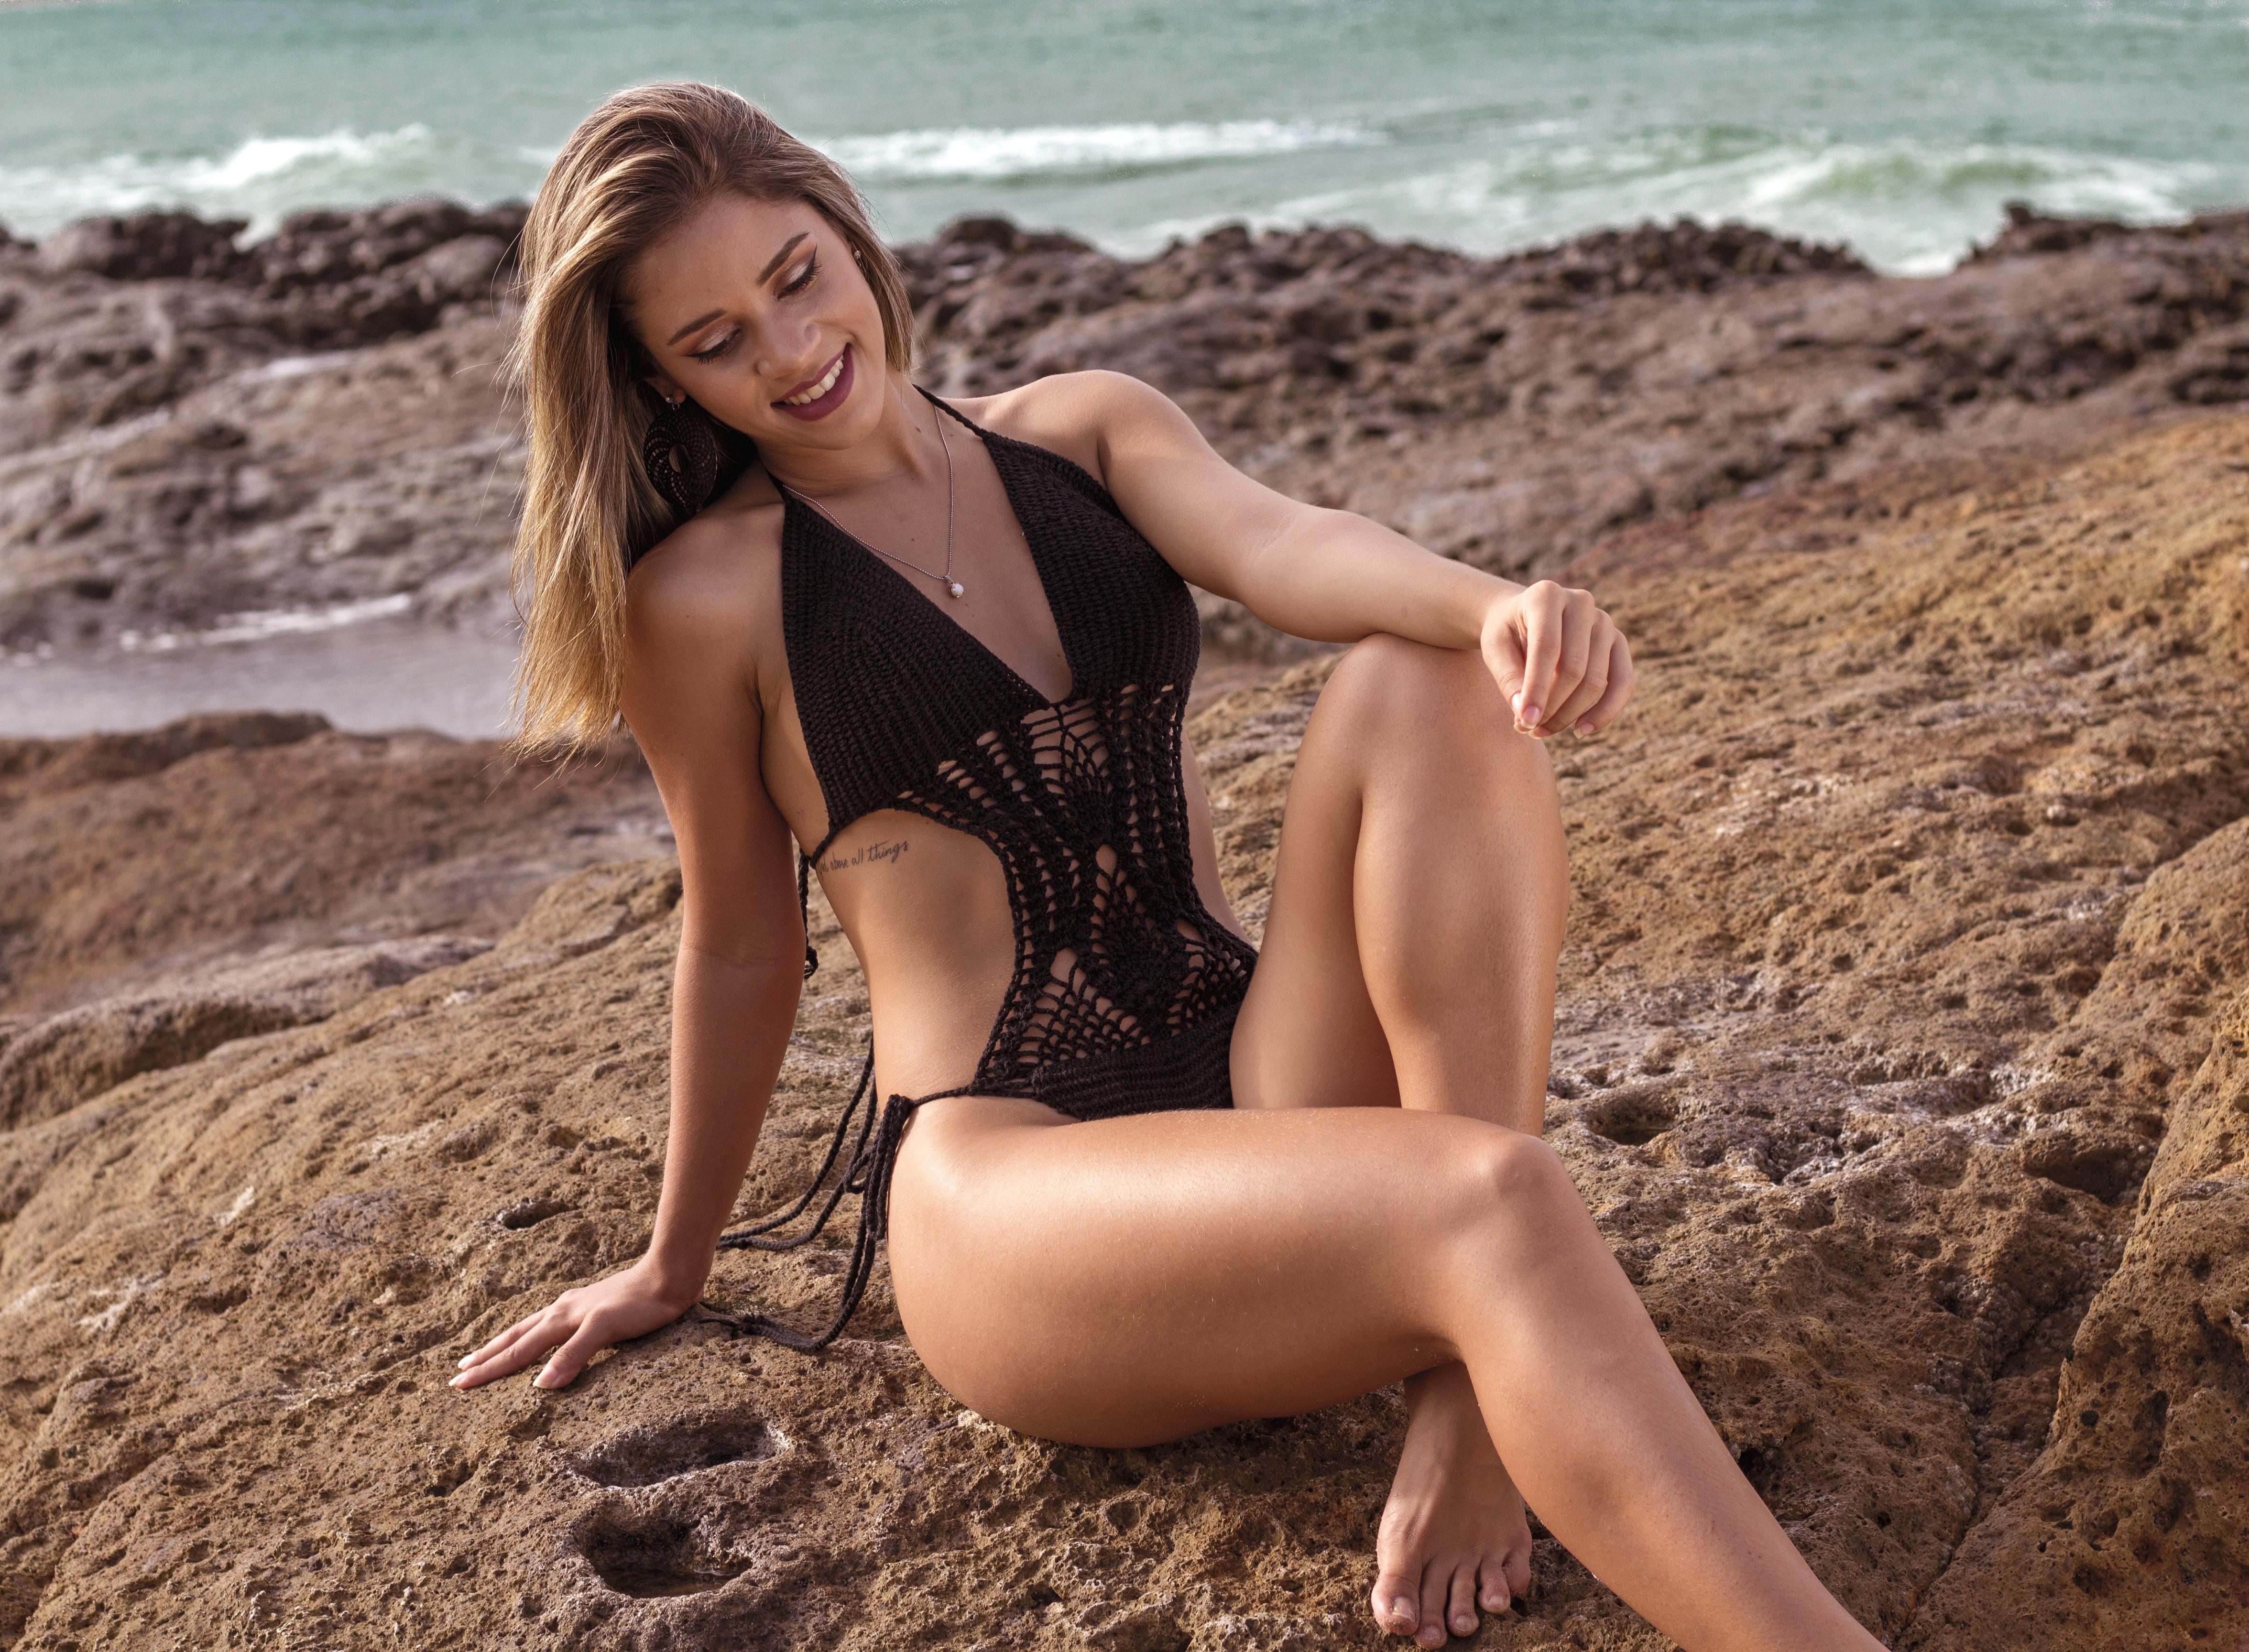 Free stock photos of beautiful women pexels free stock photo of sea fashion person beach voltagebd Images